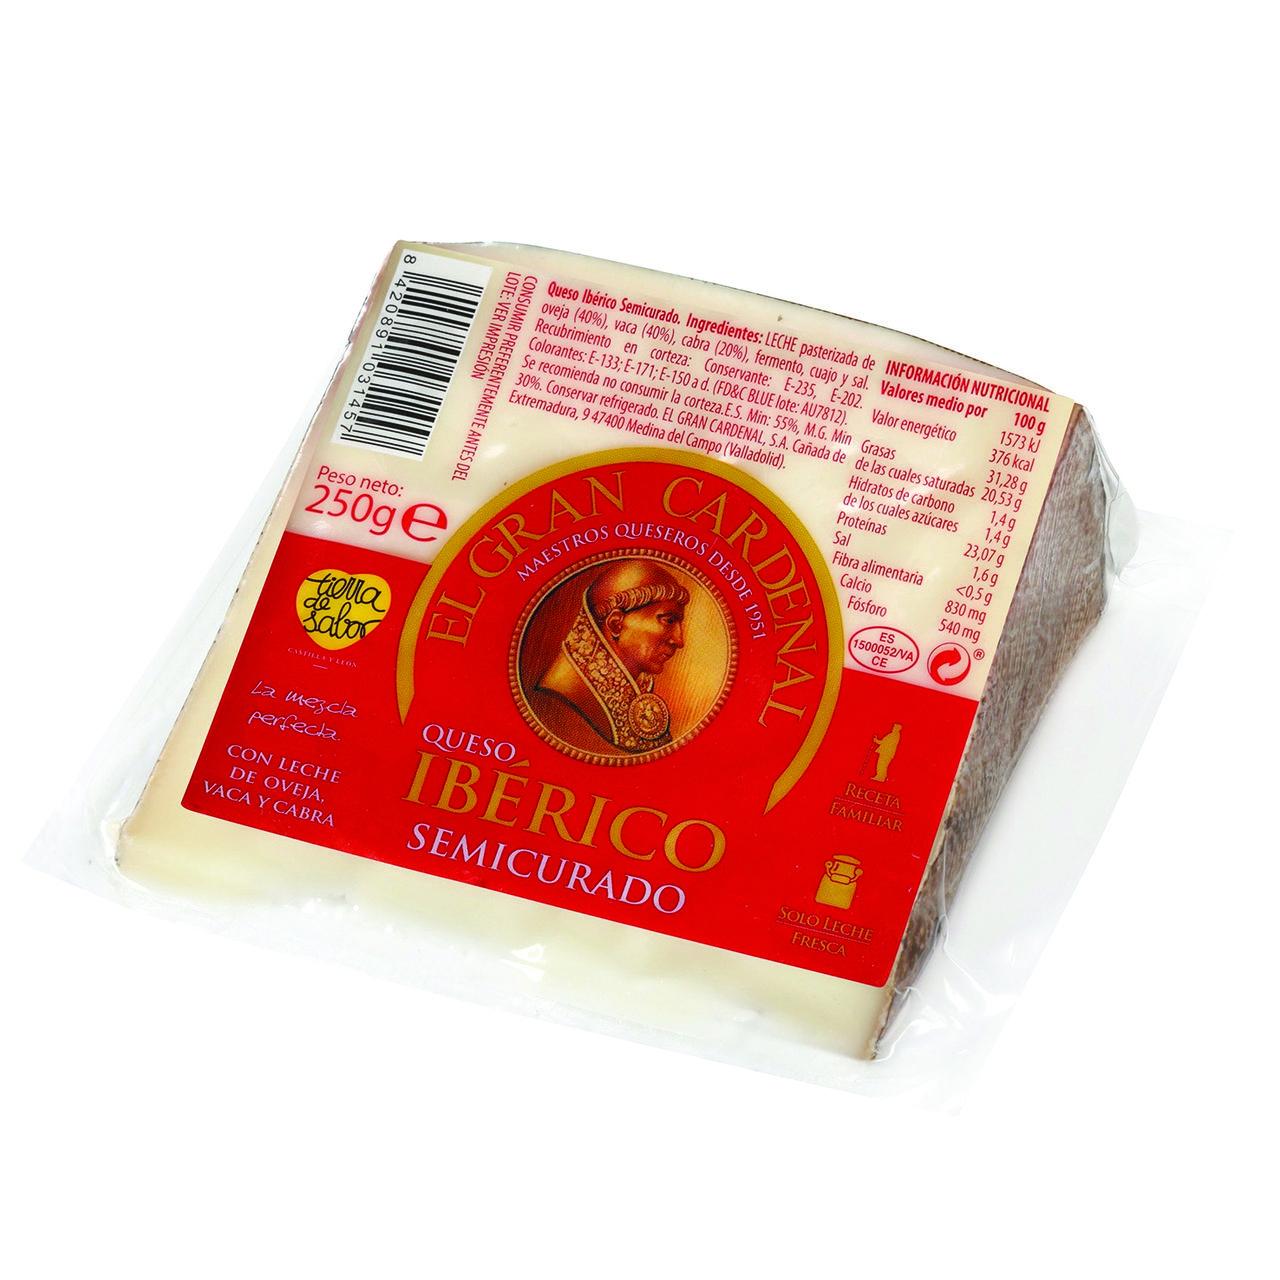 Cheese Iberico Semi Curado Del Cardenal In 2020 Cheese Wedge Iberico Cheese Chorizo Sausage